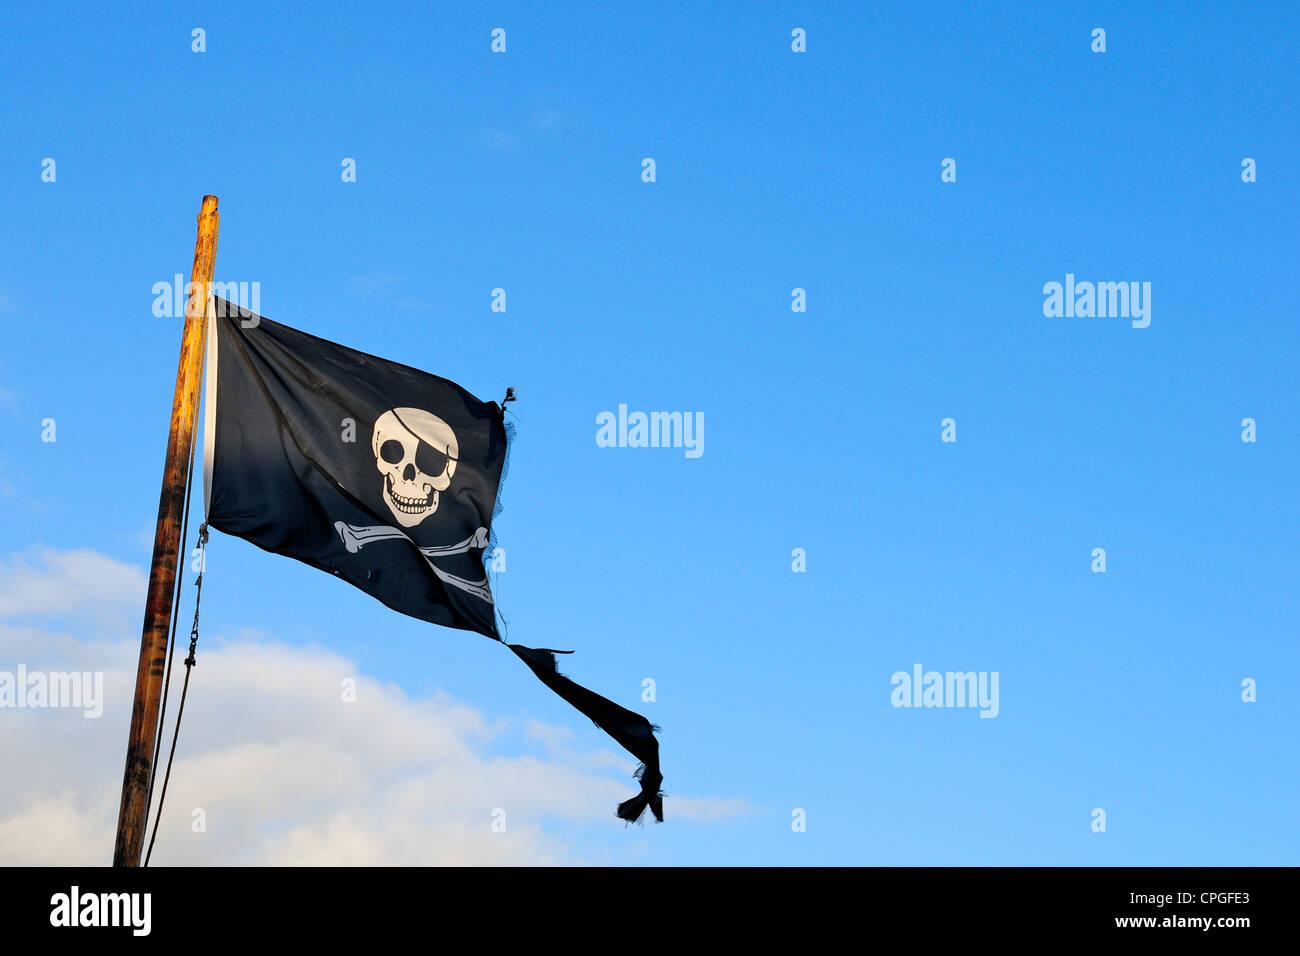 Jolly Roger / Calavera y huesos cruzados bandera pirata Imagen De Stock